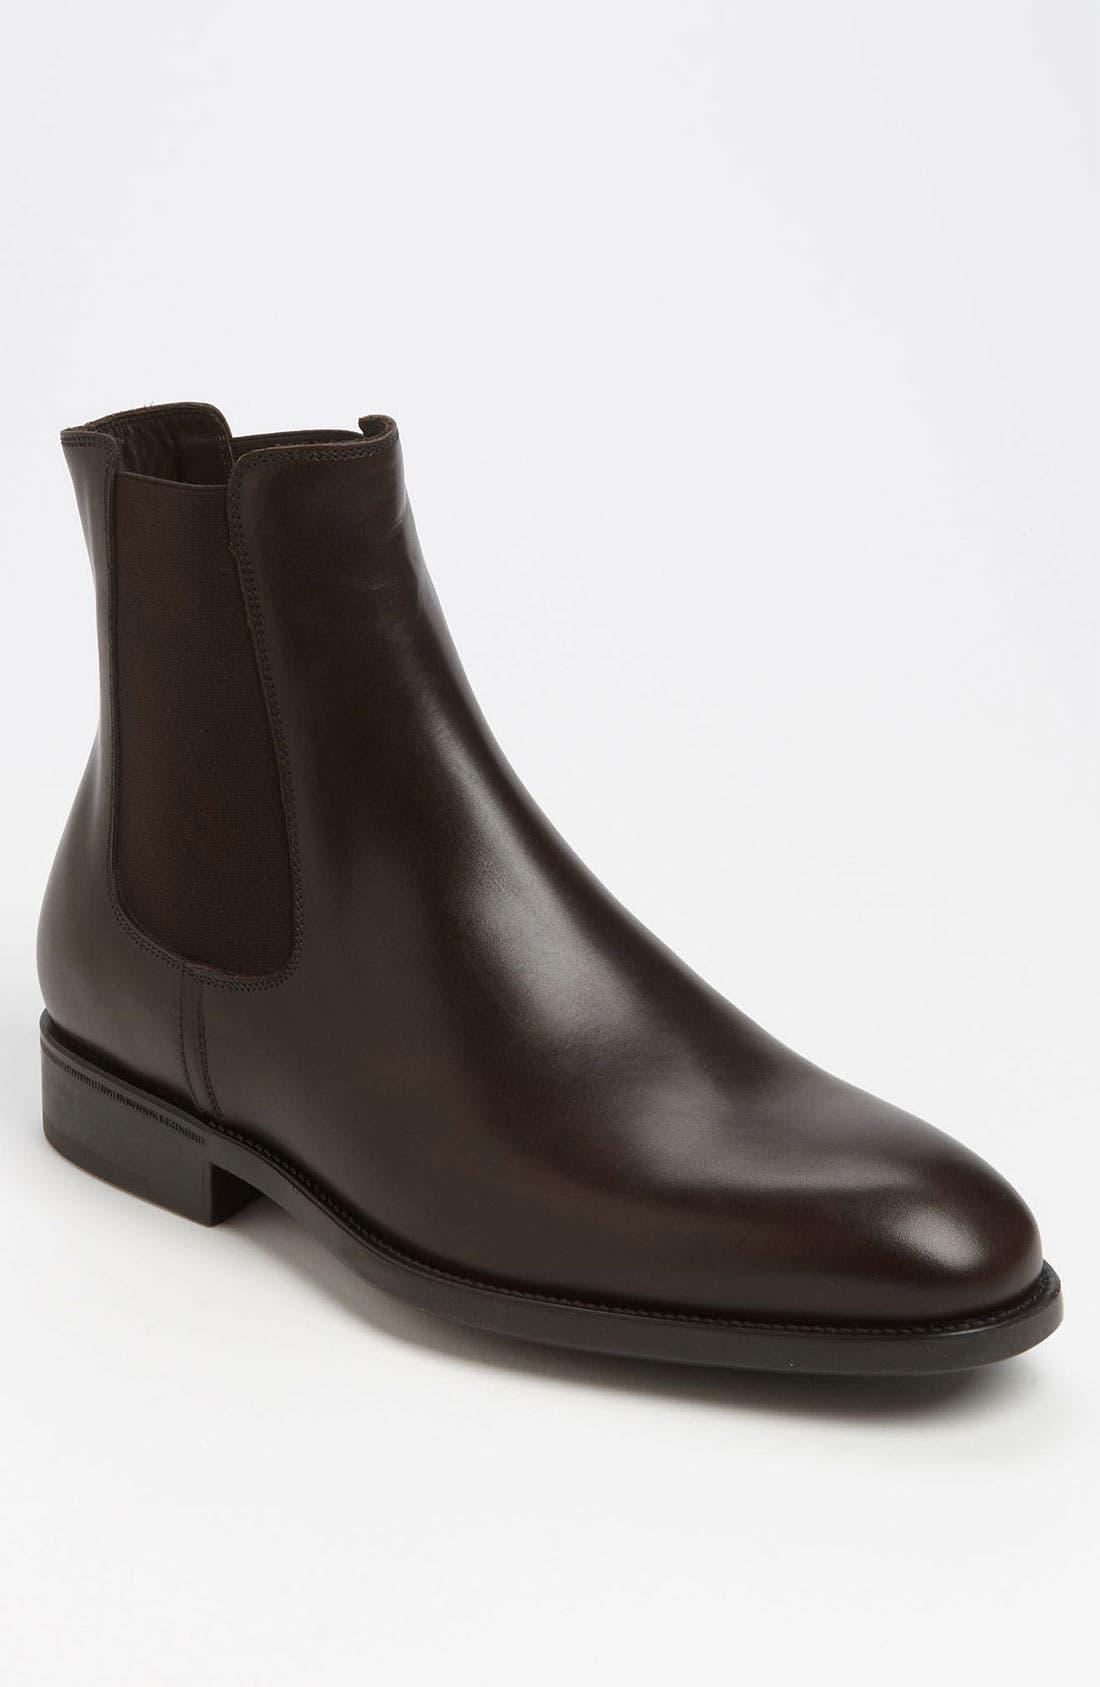 Main Image - Salvatore Ferragamo 'Arden' Chelsea Boot